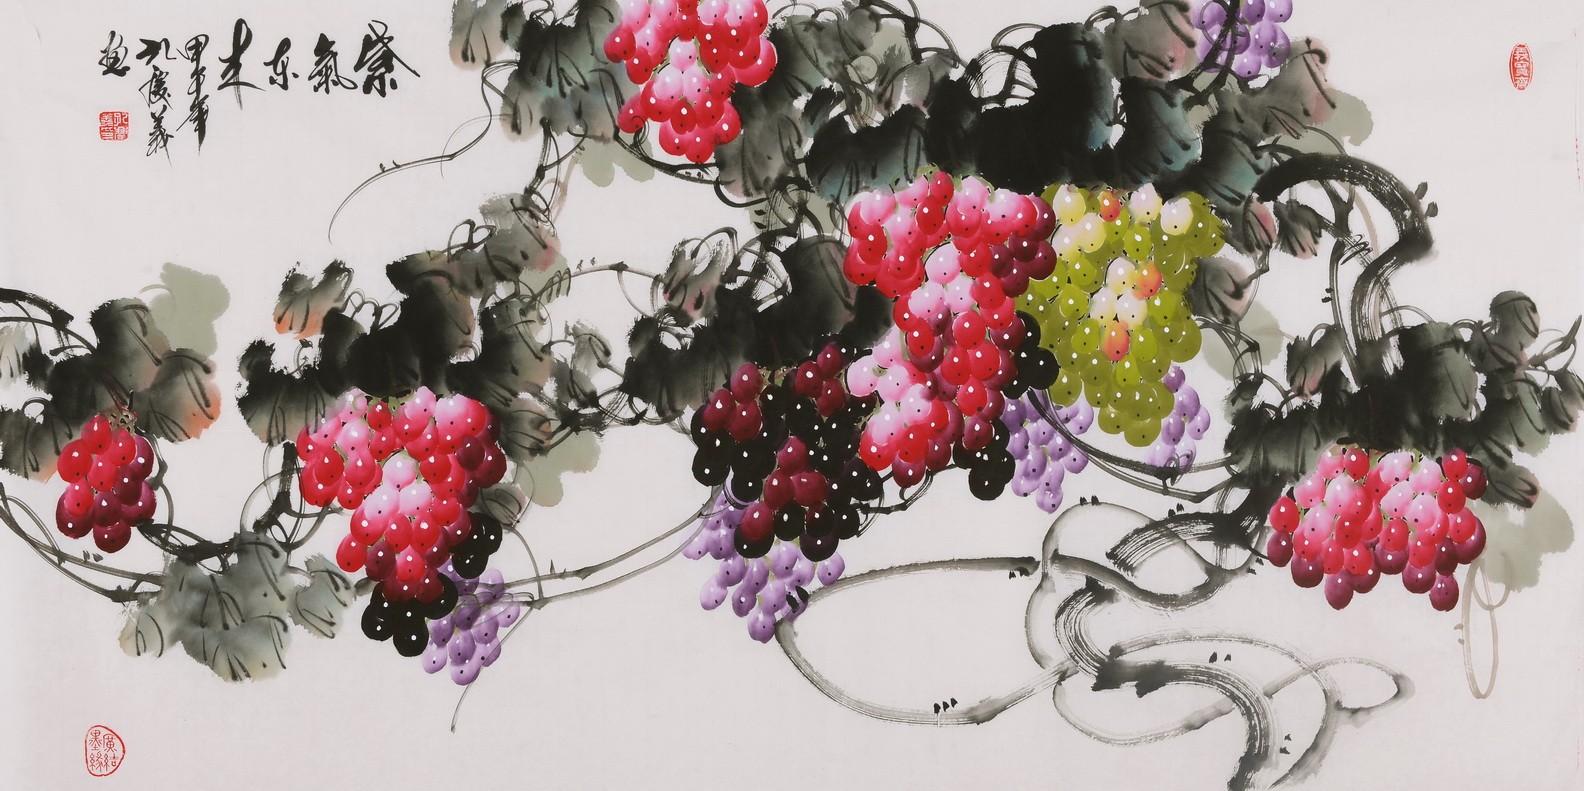 Grapes - CNAG003534